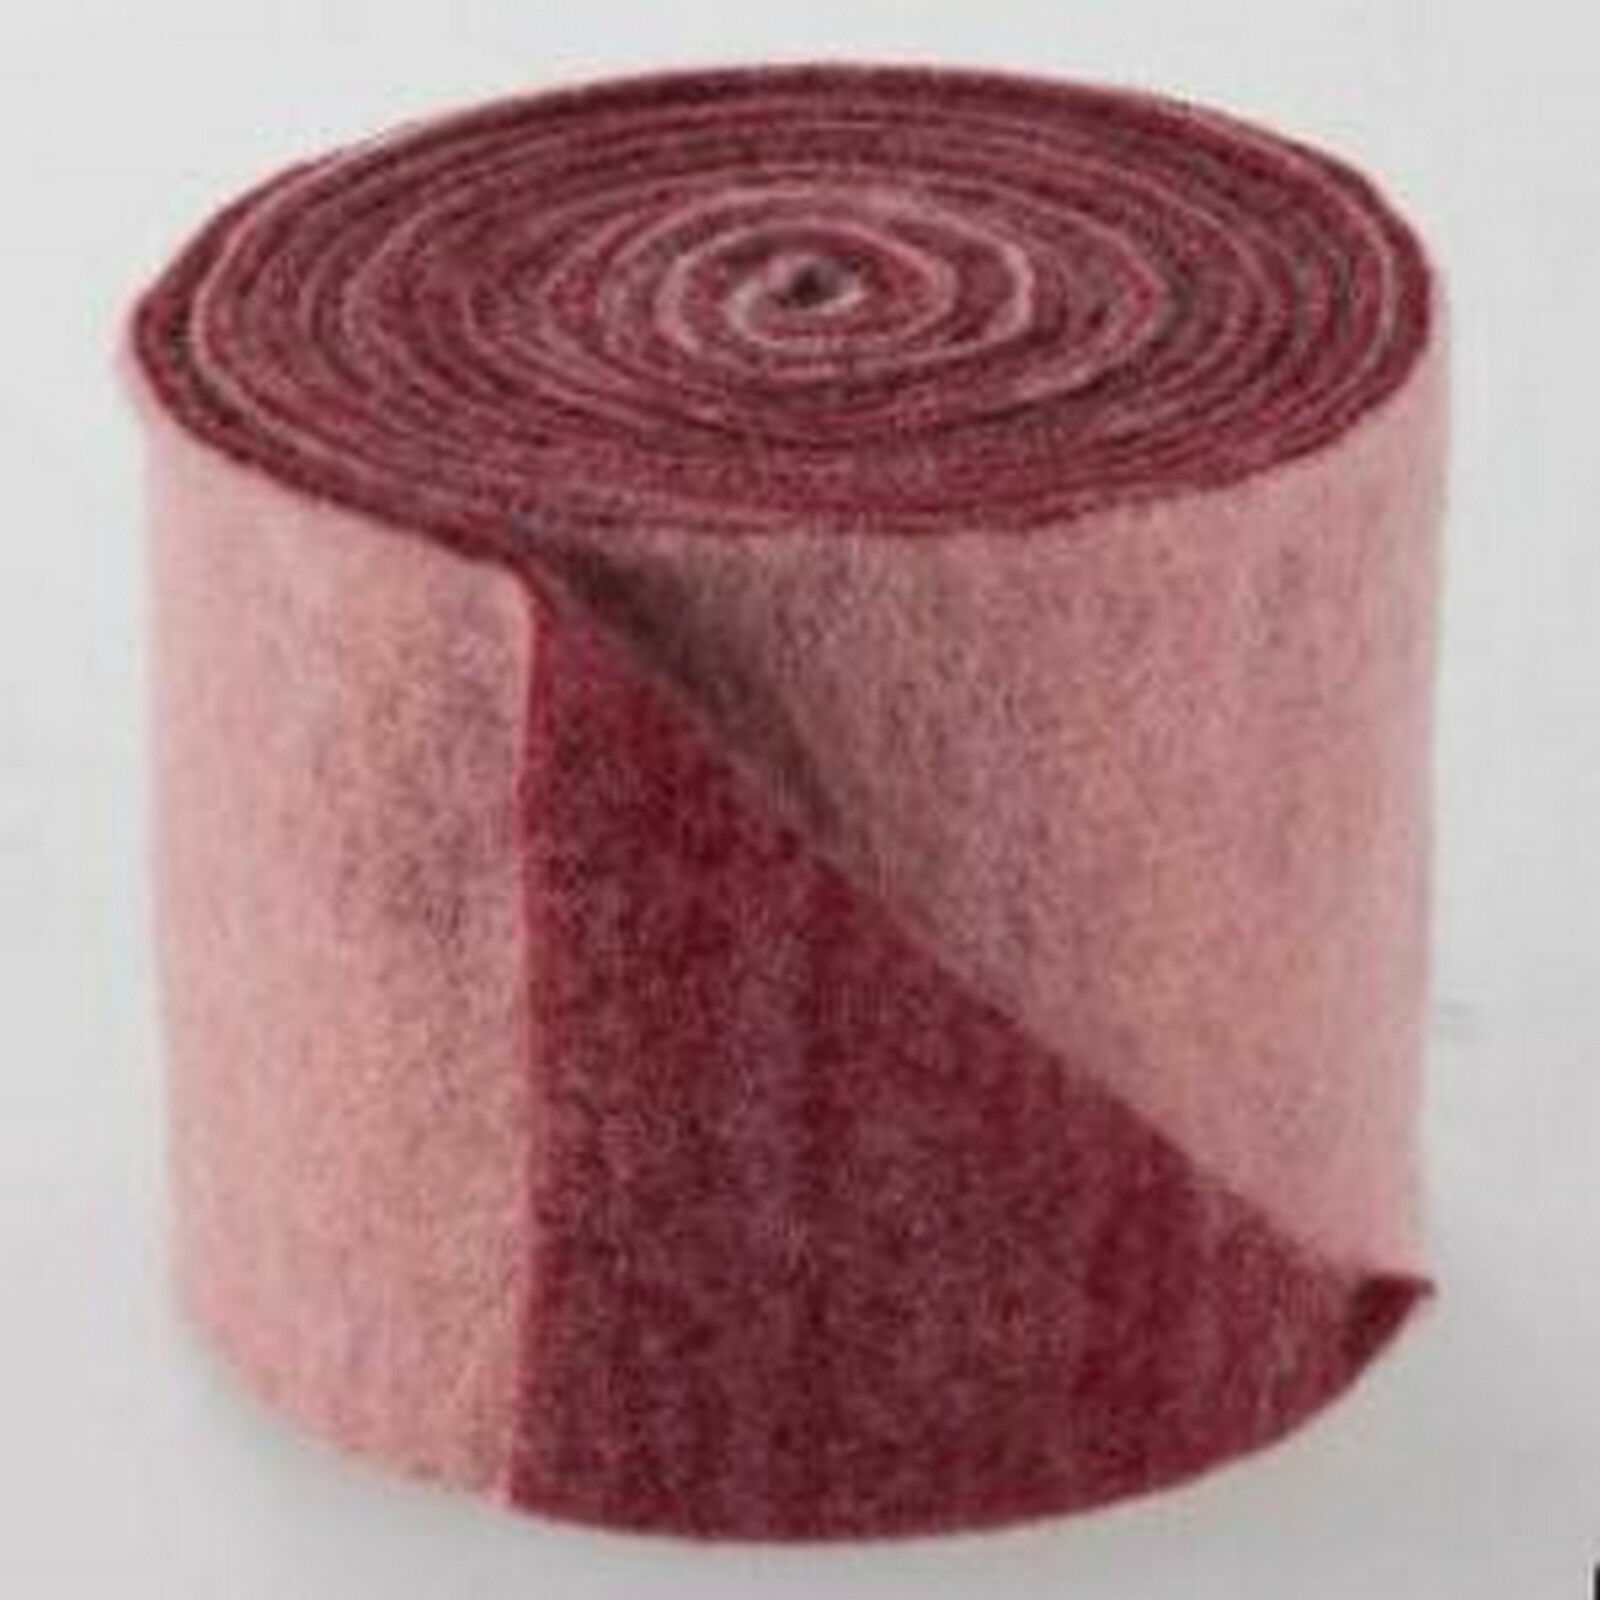 Topfband Filz 5 m x 15 cm zwei-farbige Dekoband Wollvlies Filz-Band Wollband  - rosa-bordeaux